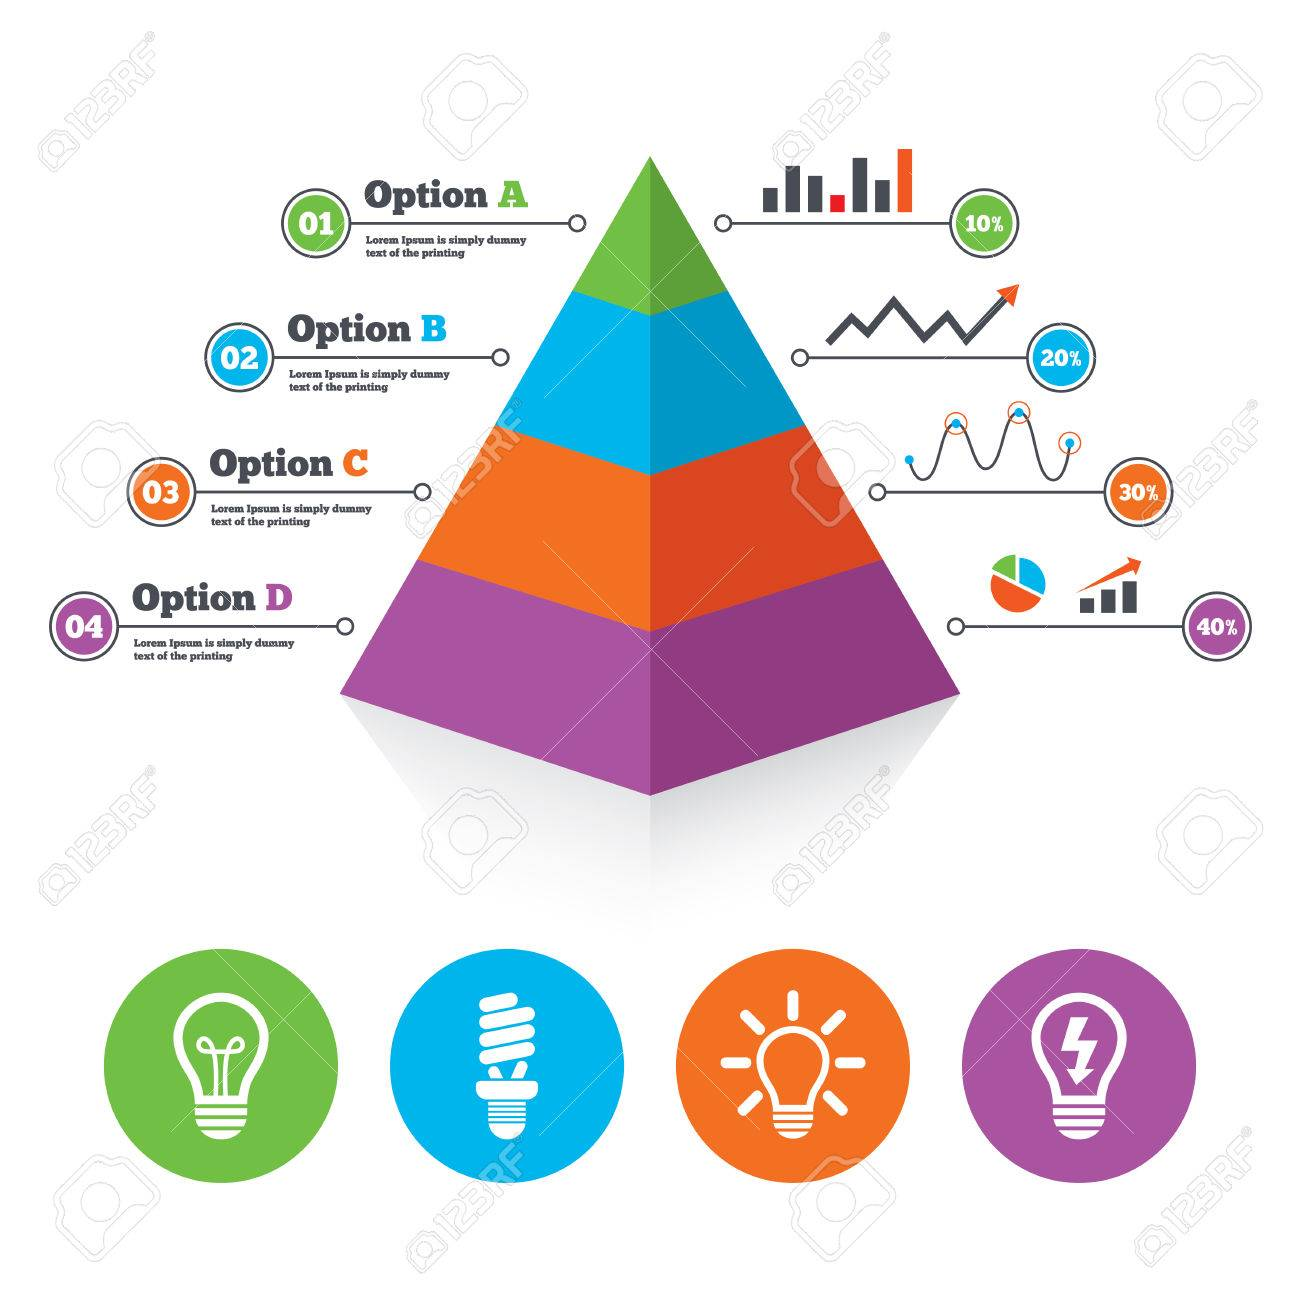 hight resolution of pyramid chart template light lamp icons fluorescent lamp bulb symbols energy saving